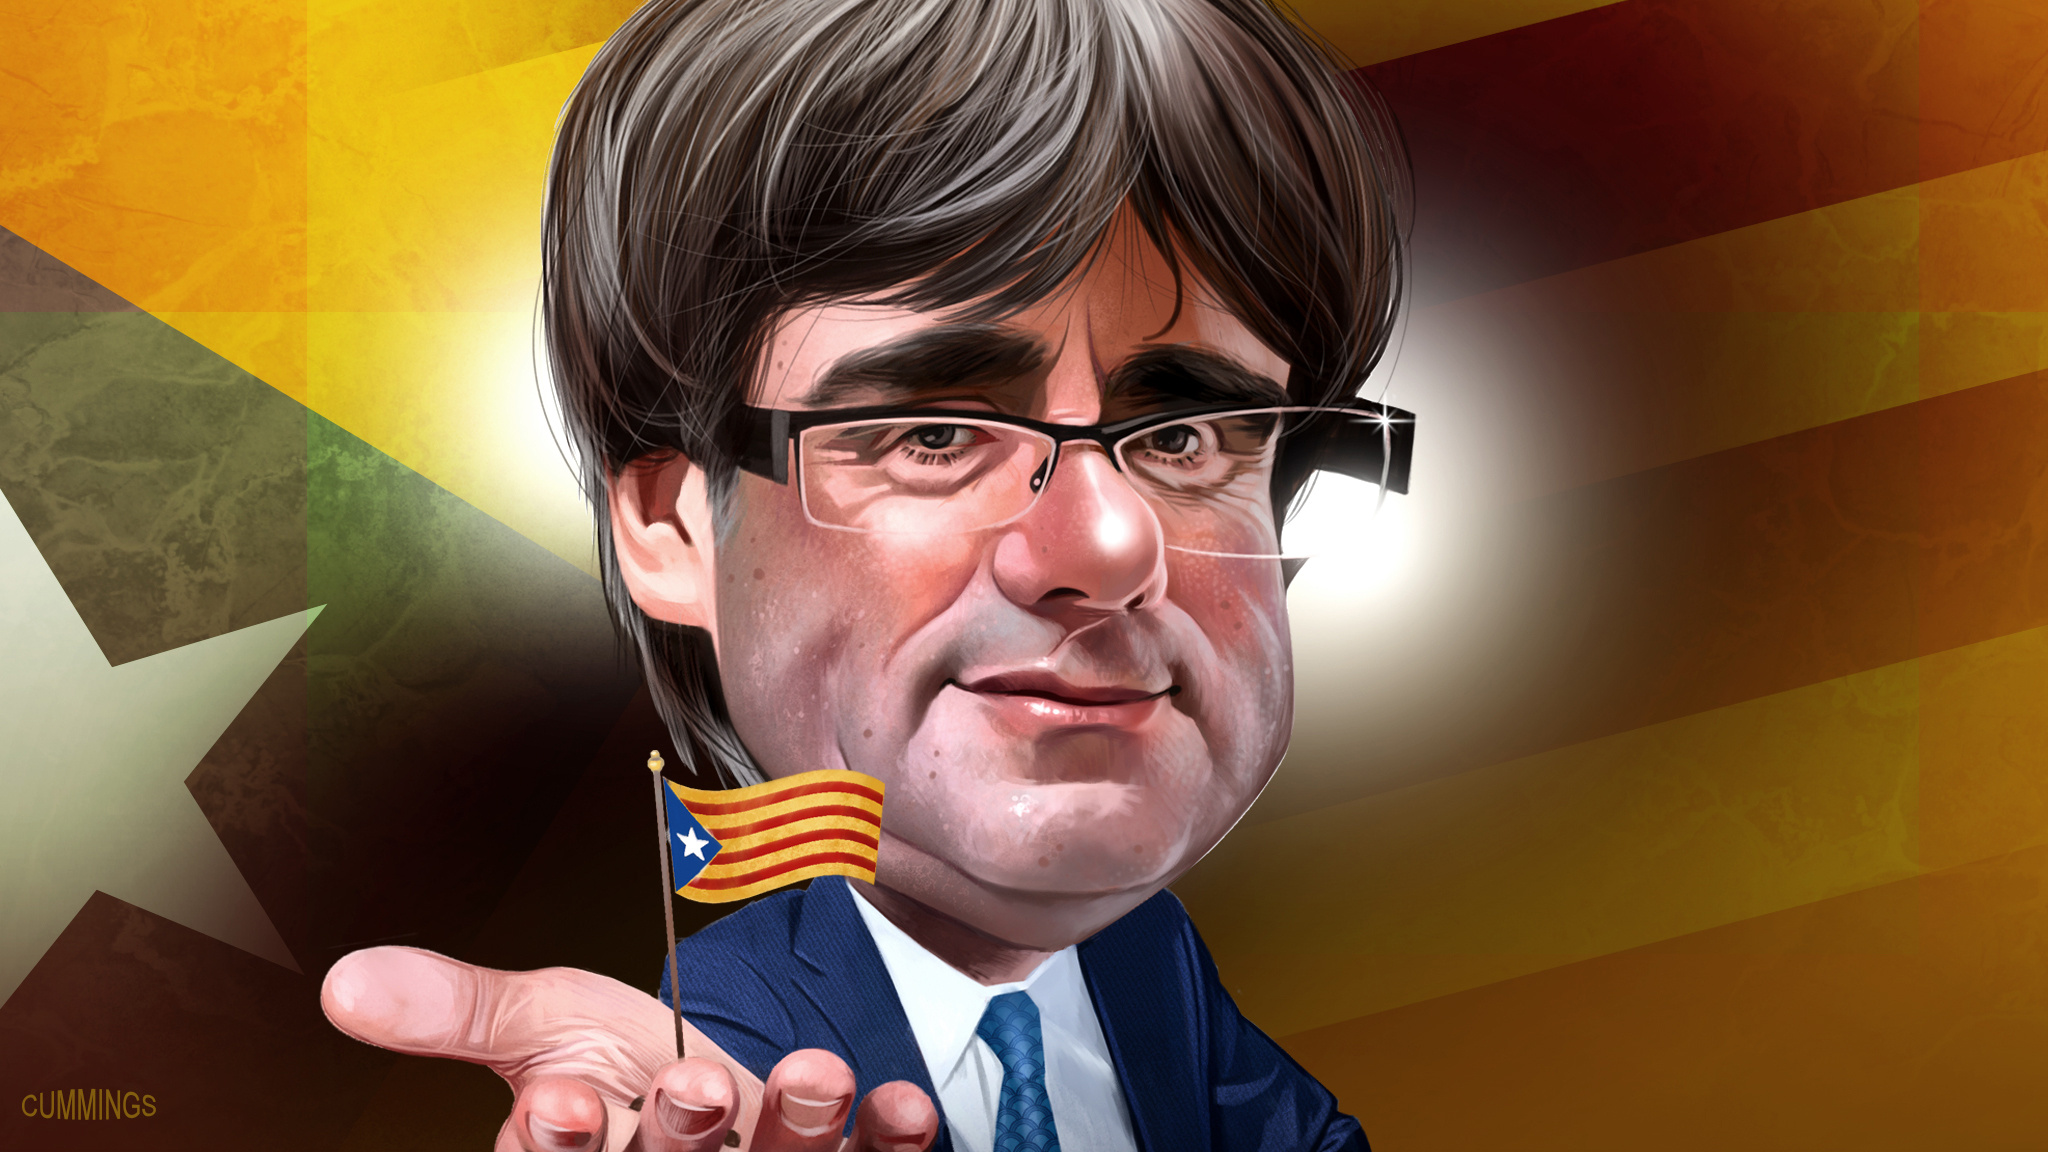 Carles Puigdemont Catalonia S Breakaway Leader